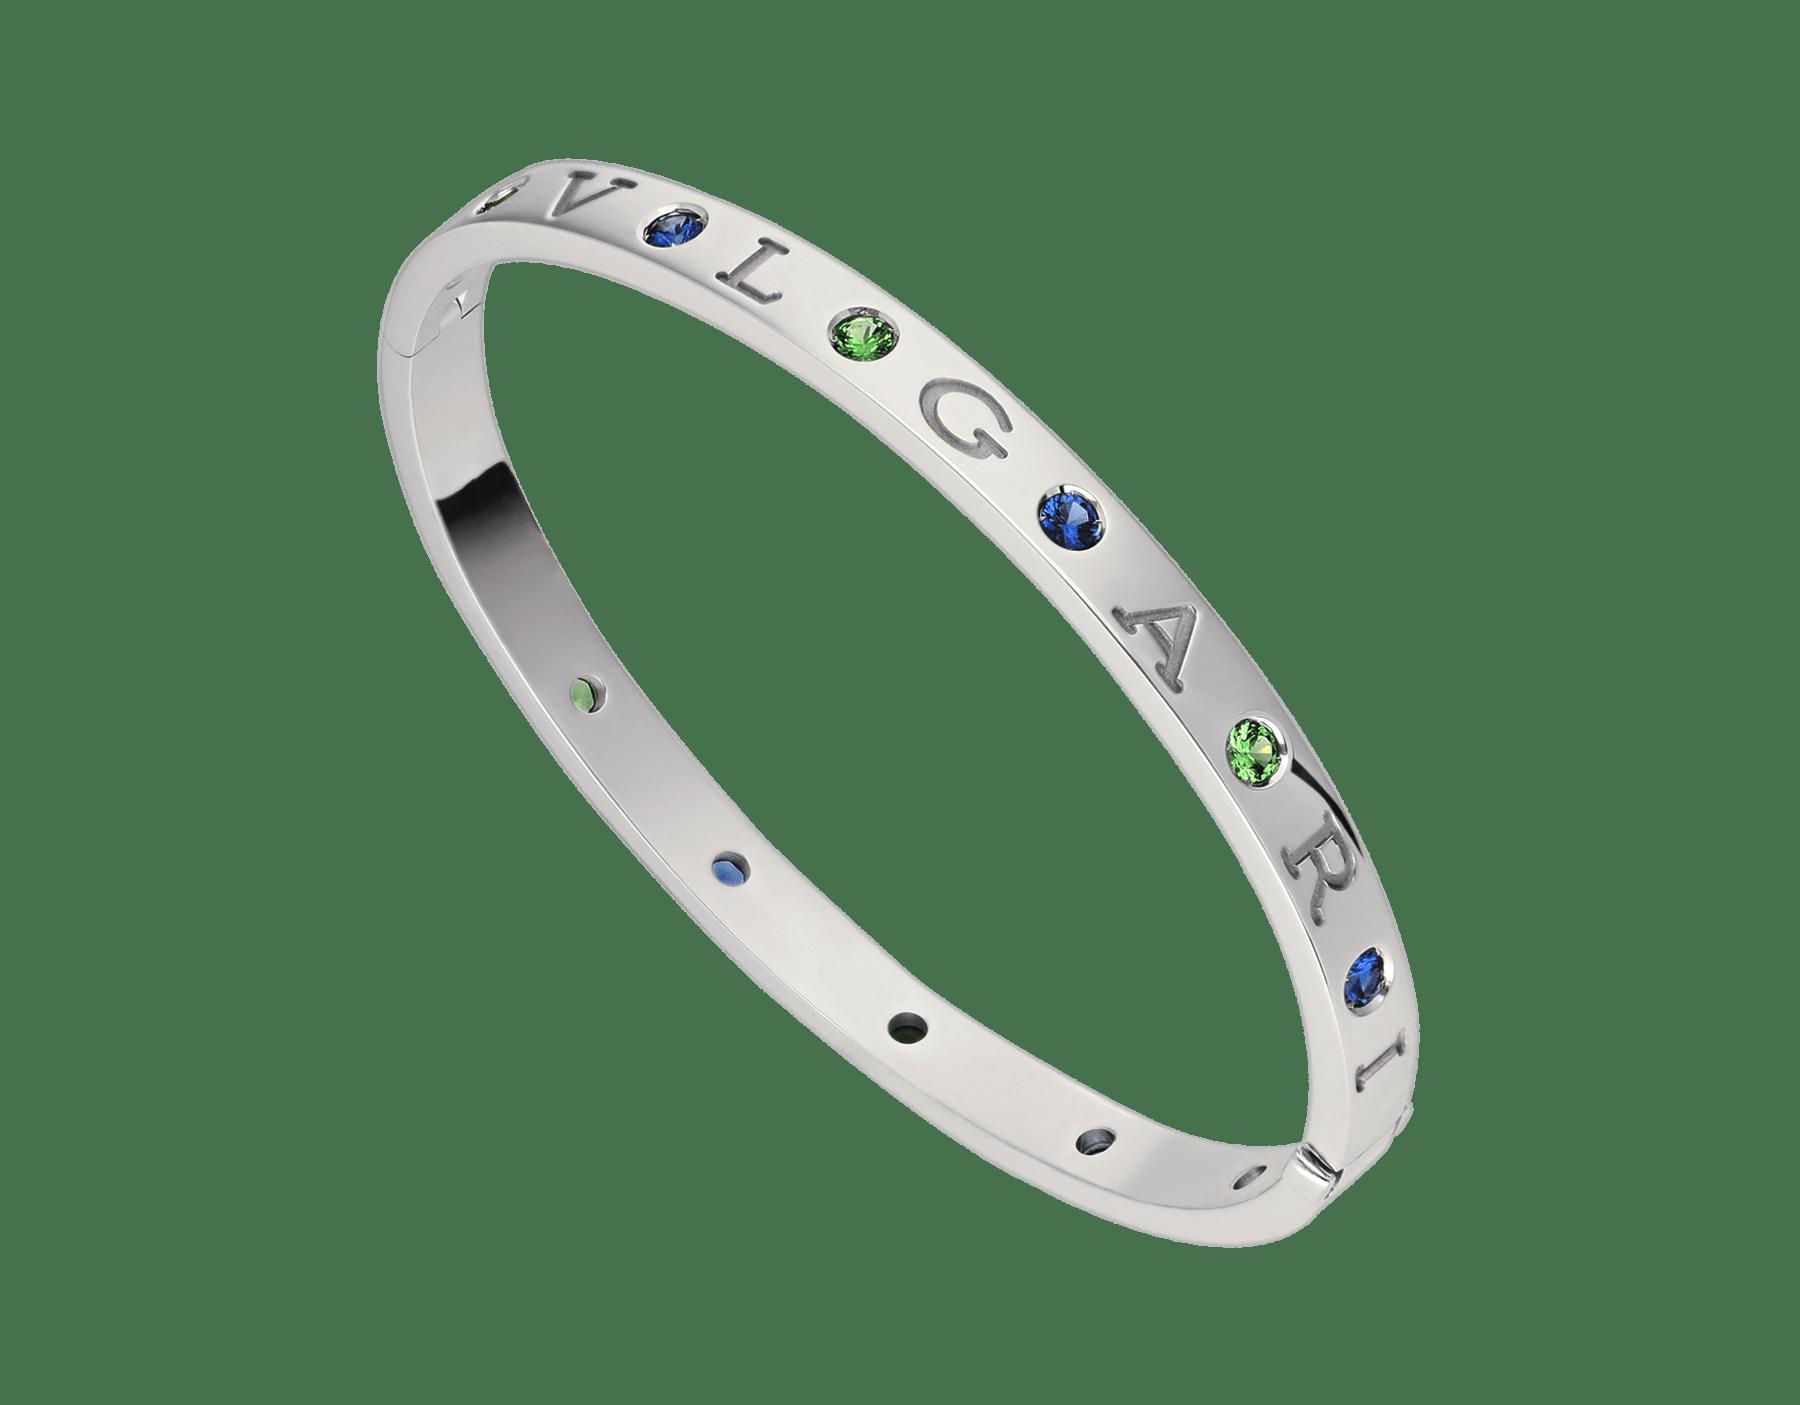 Bracelet jonc BVLGARI BVLGARI en or blanc 18K serti de six saphirs et six tsavorites BR857636 image 1